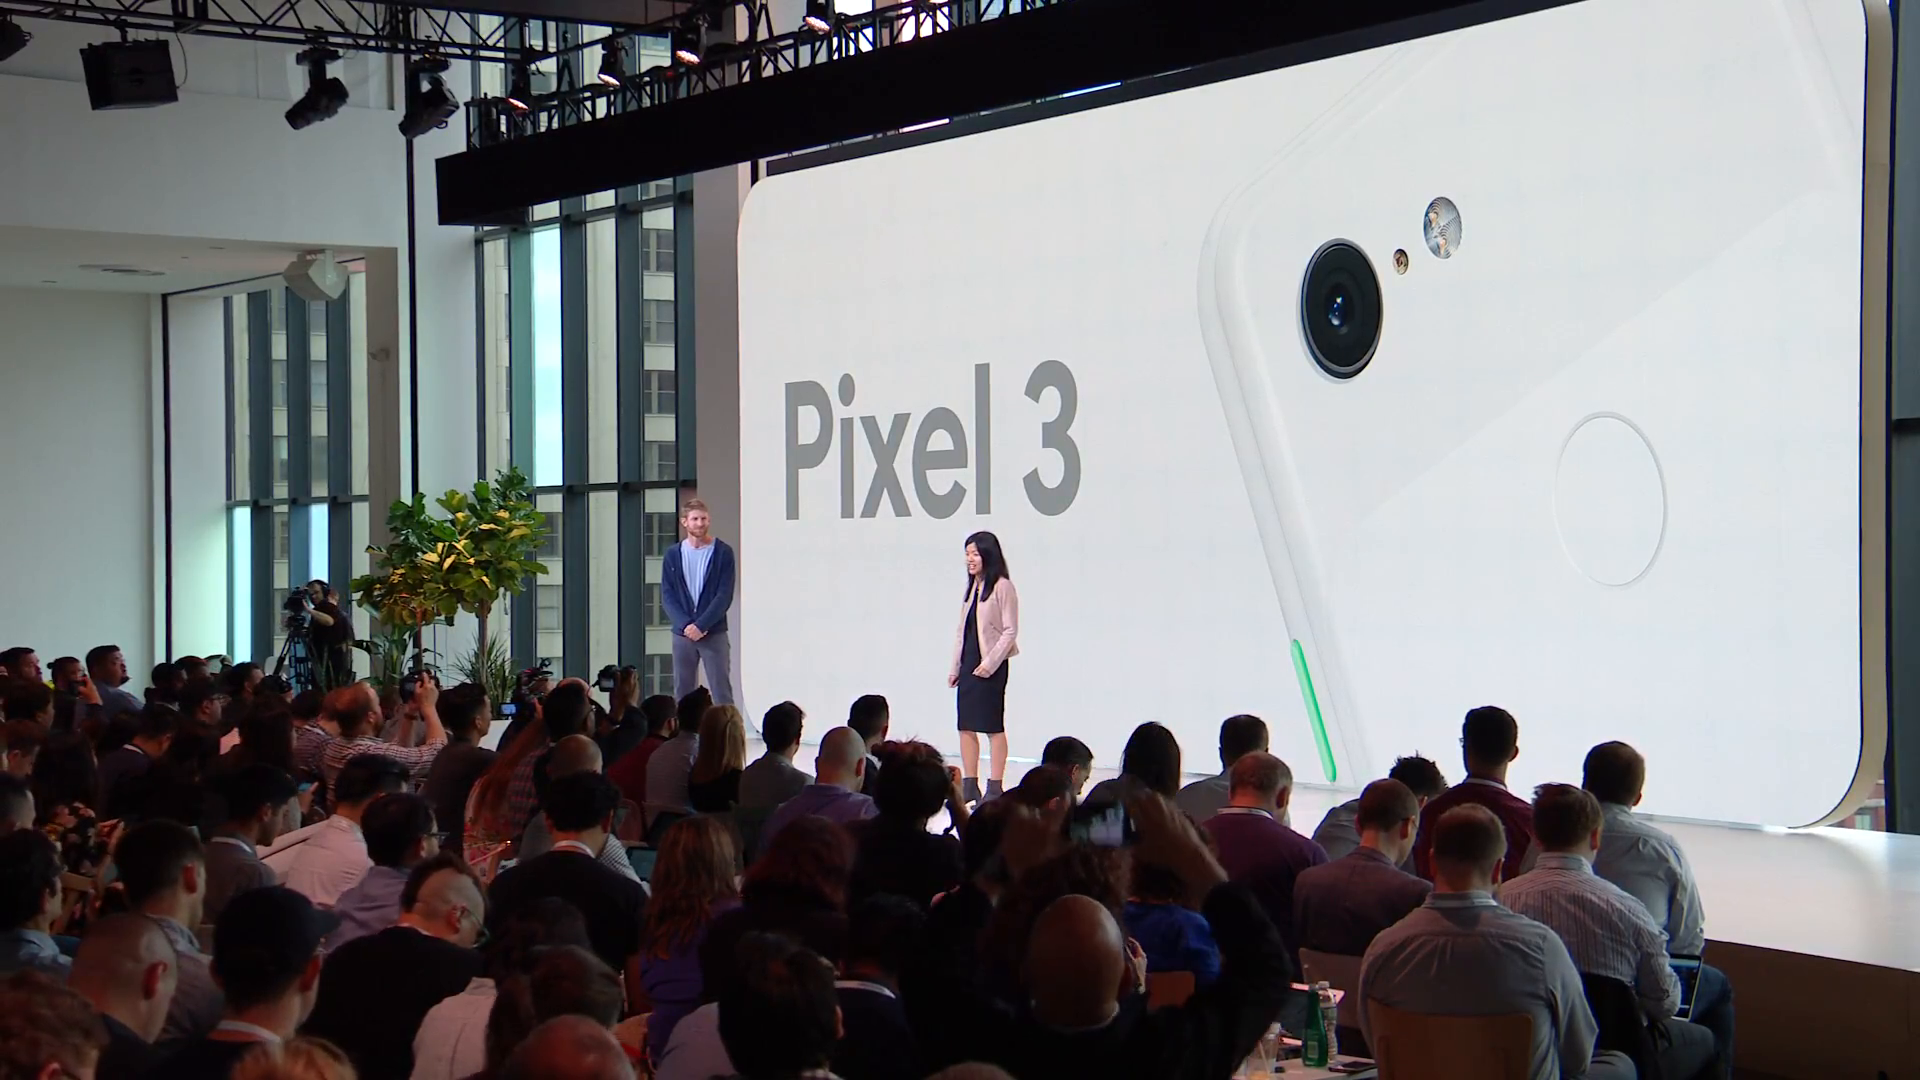 Google Pixel 3 Apple iPhone concurrent